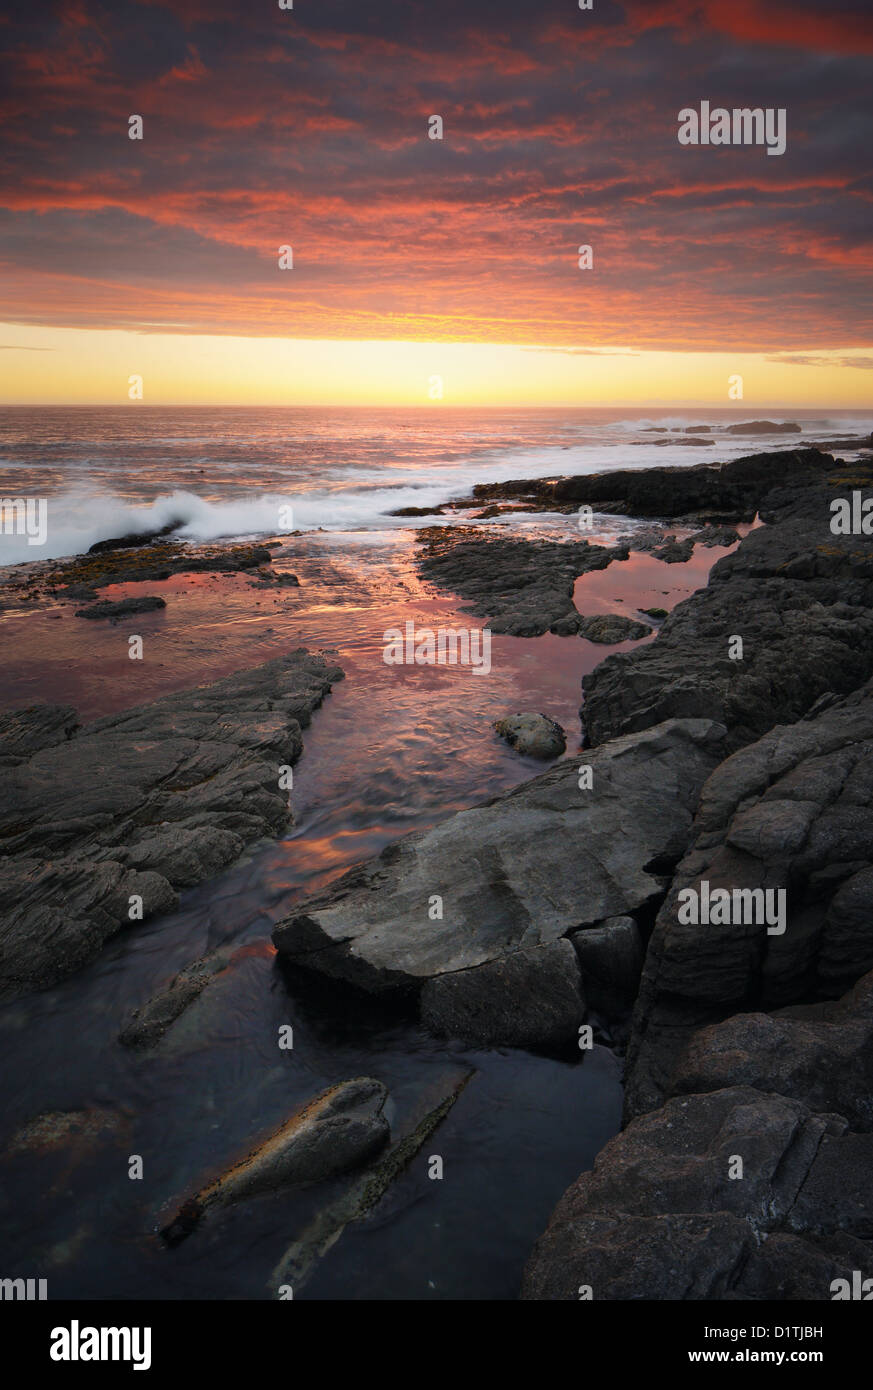 Sunset over rocky coastline (Hermanus - Cape Province - South Africa) - Stock Image